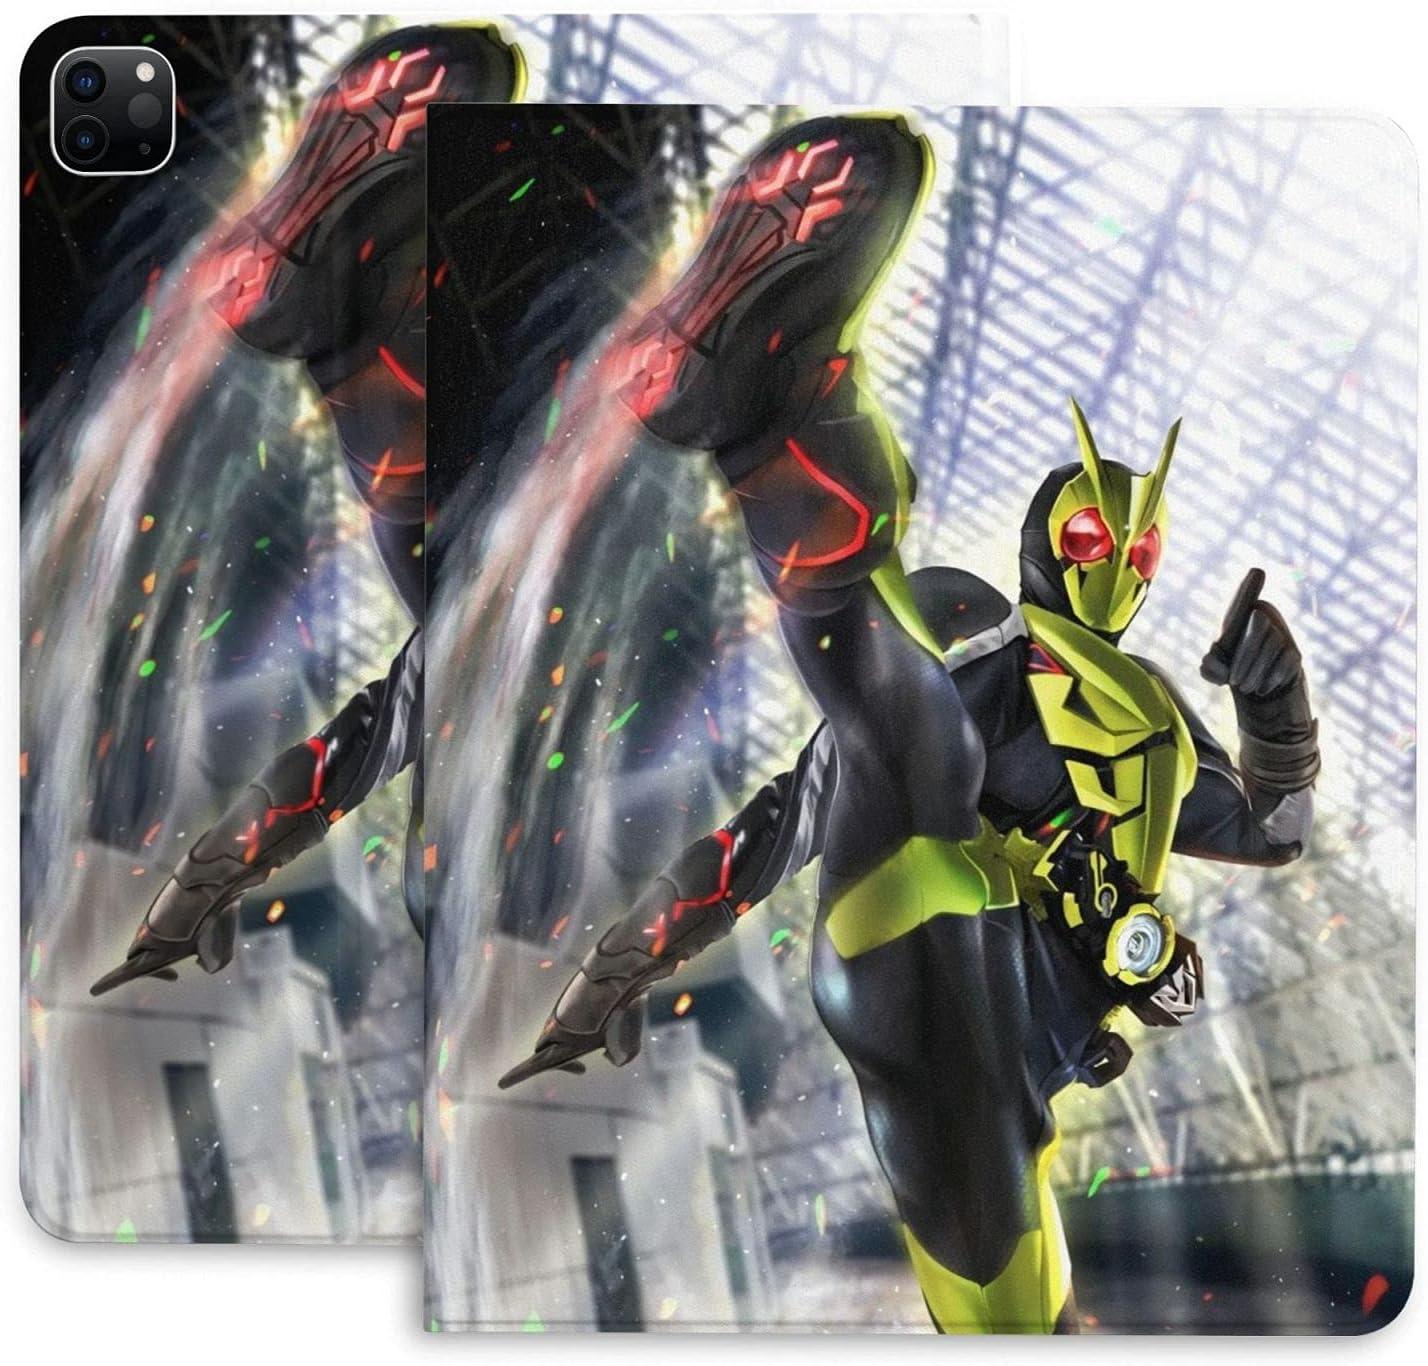 Kamen Rider IPad 35% OFF Case 2020 Ipad Anime Pro Genuine Free Shipping 11 Sl Inch Tablet